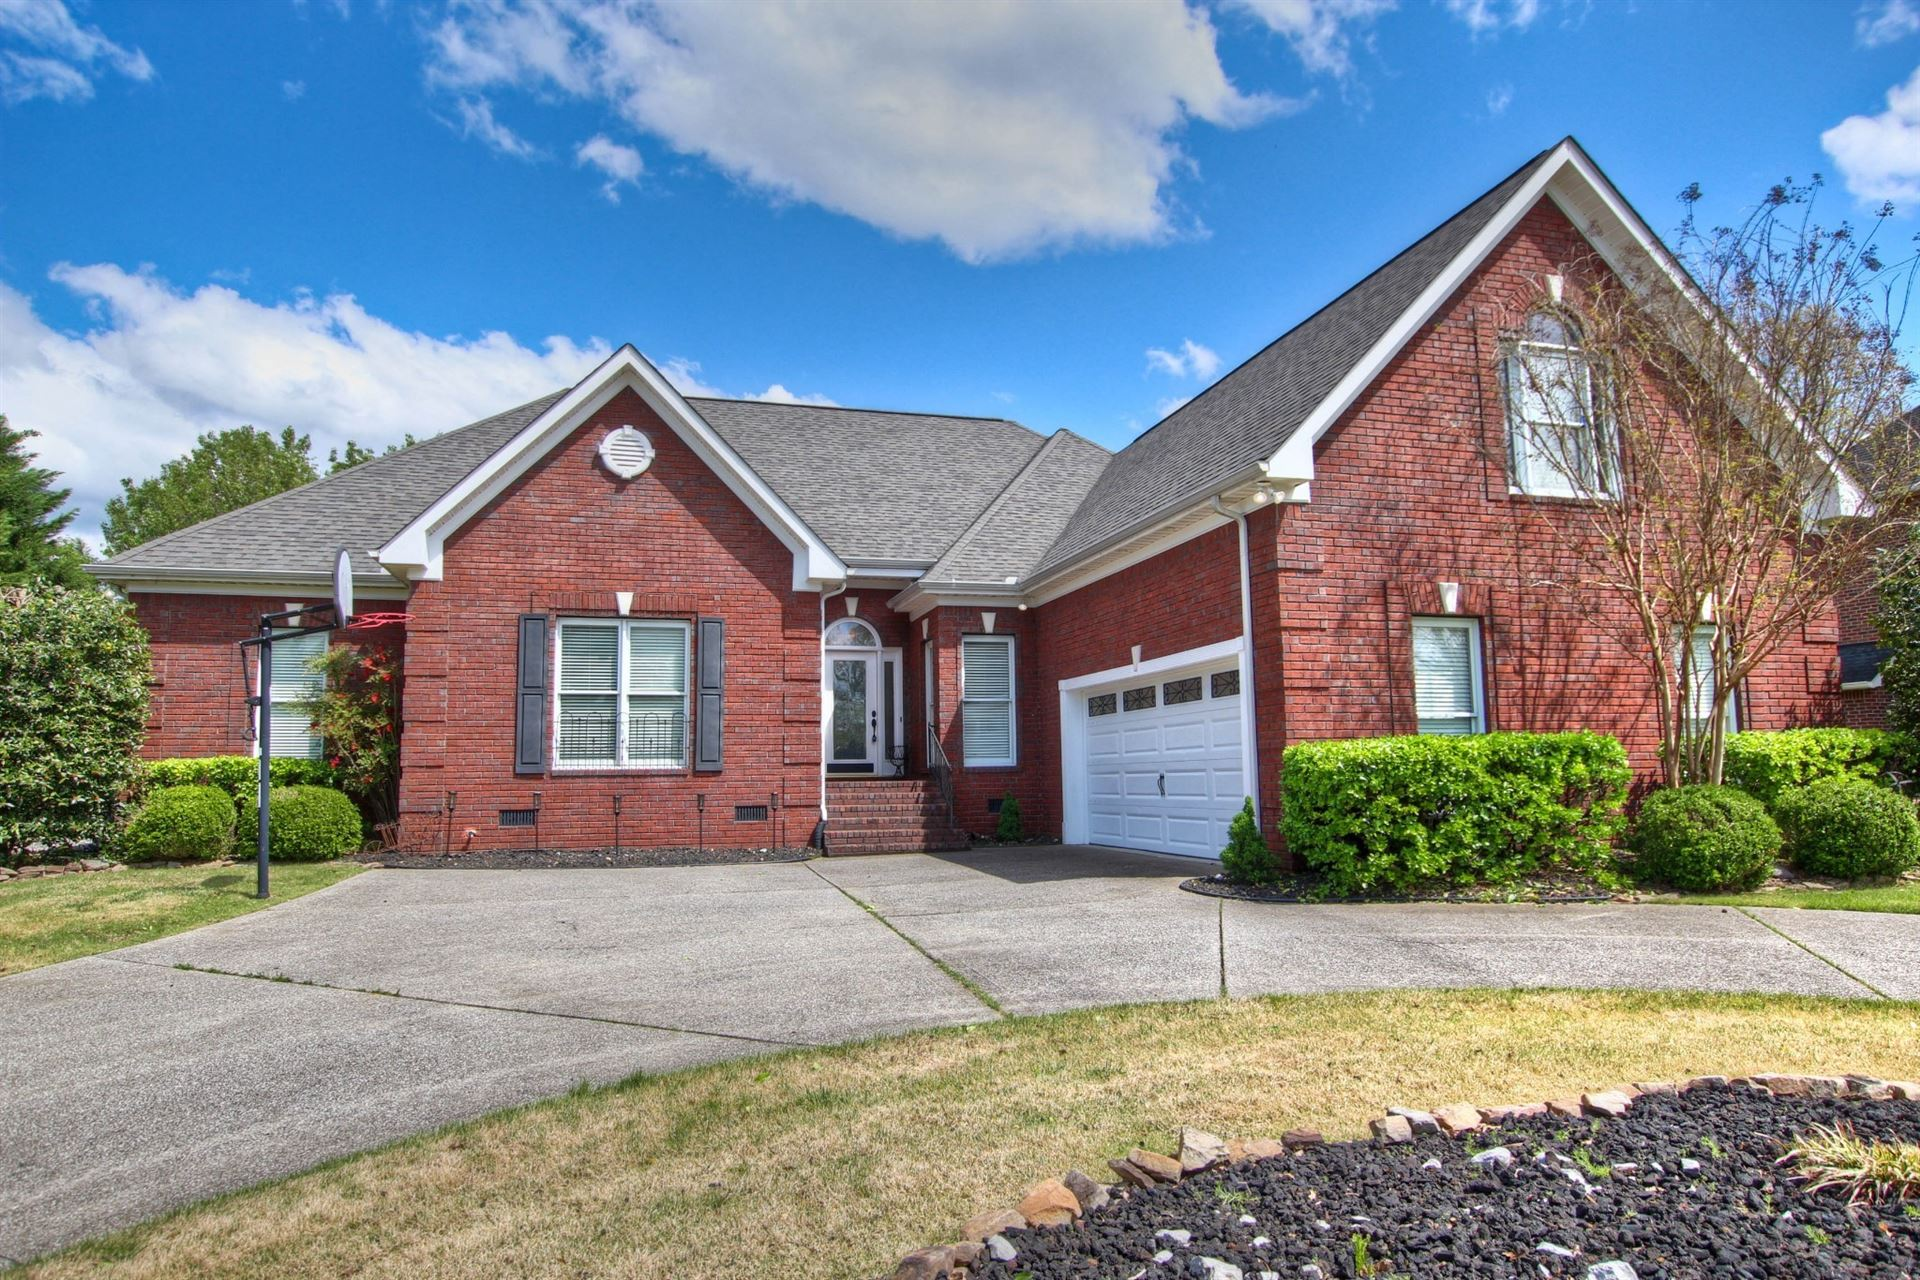 2731 American Horse Trl, Murfreesboro, TN 37127 - MLS#: 2278181